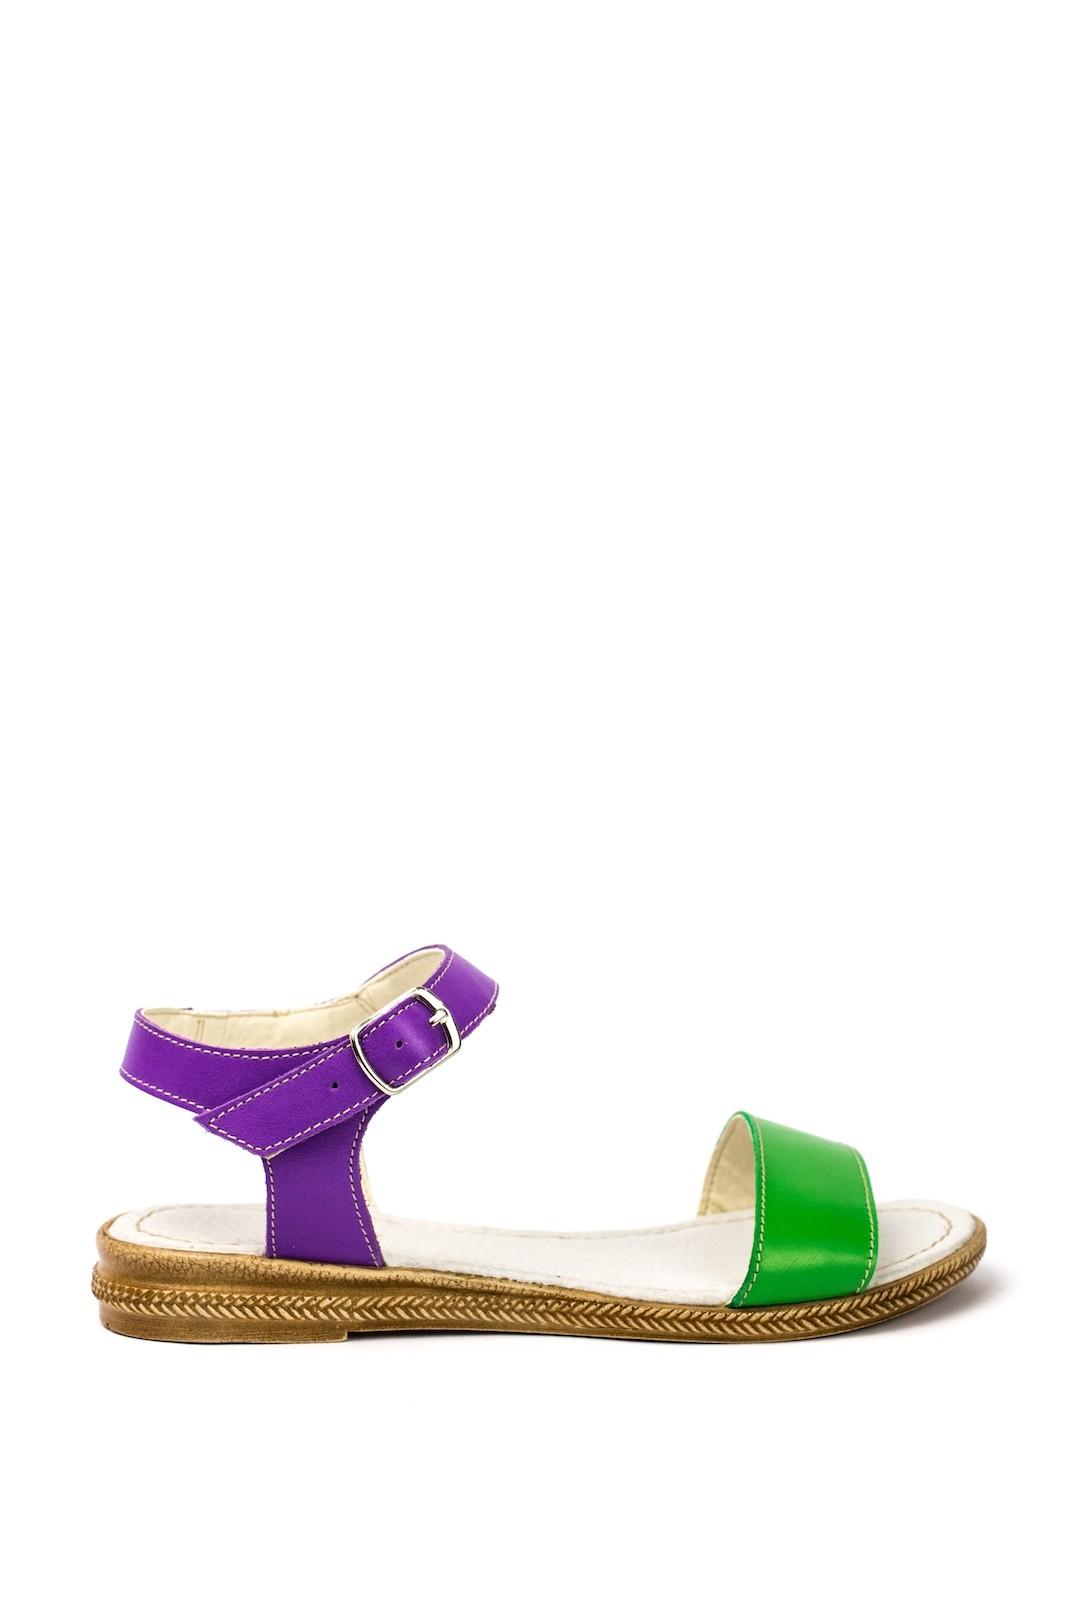 Sandale Dama piele naturala verde mov Coralia